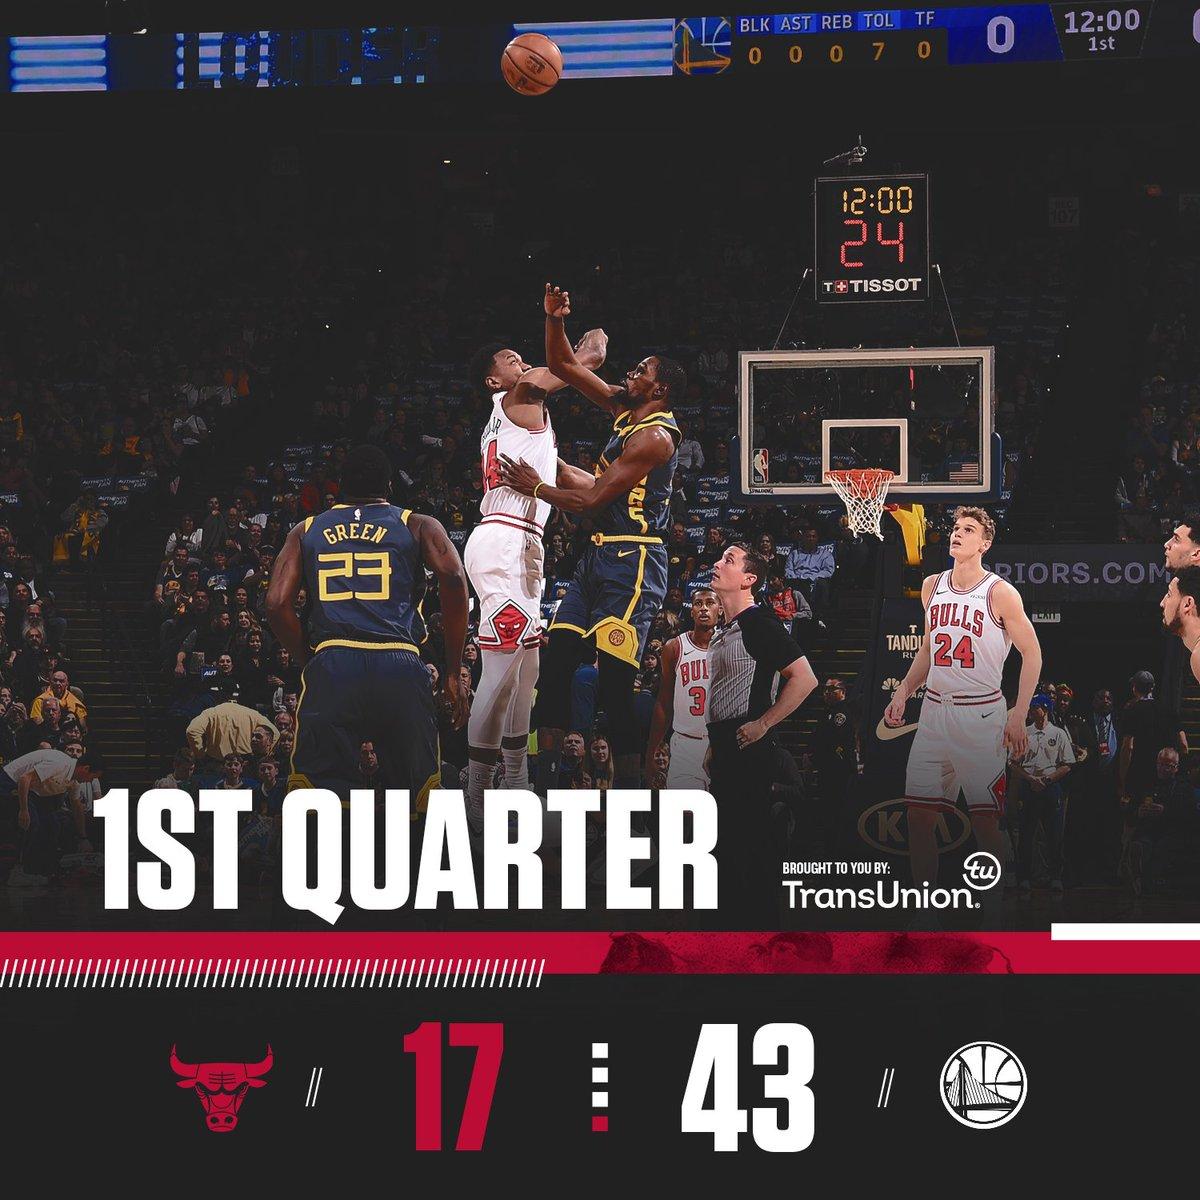 We've had better quarters.